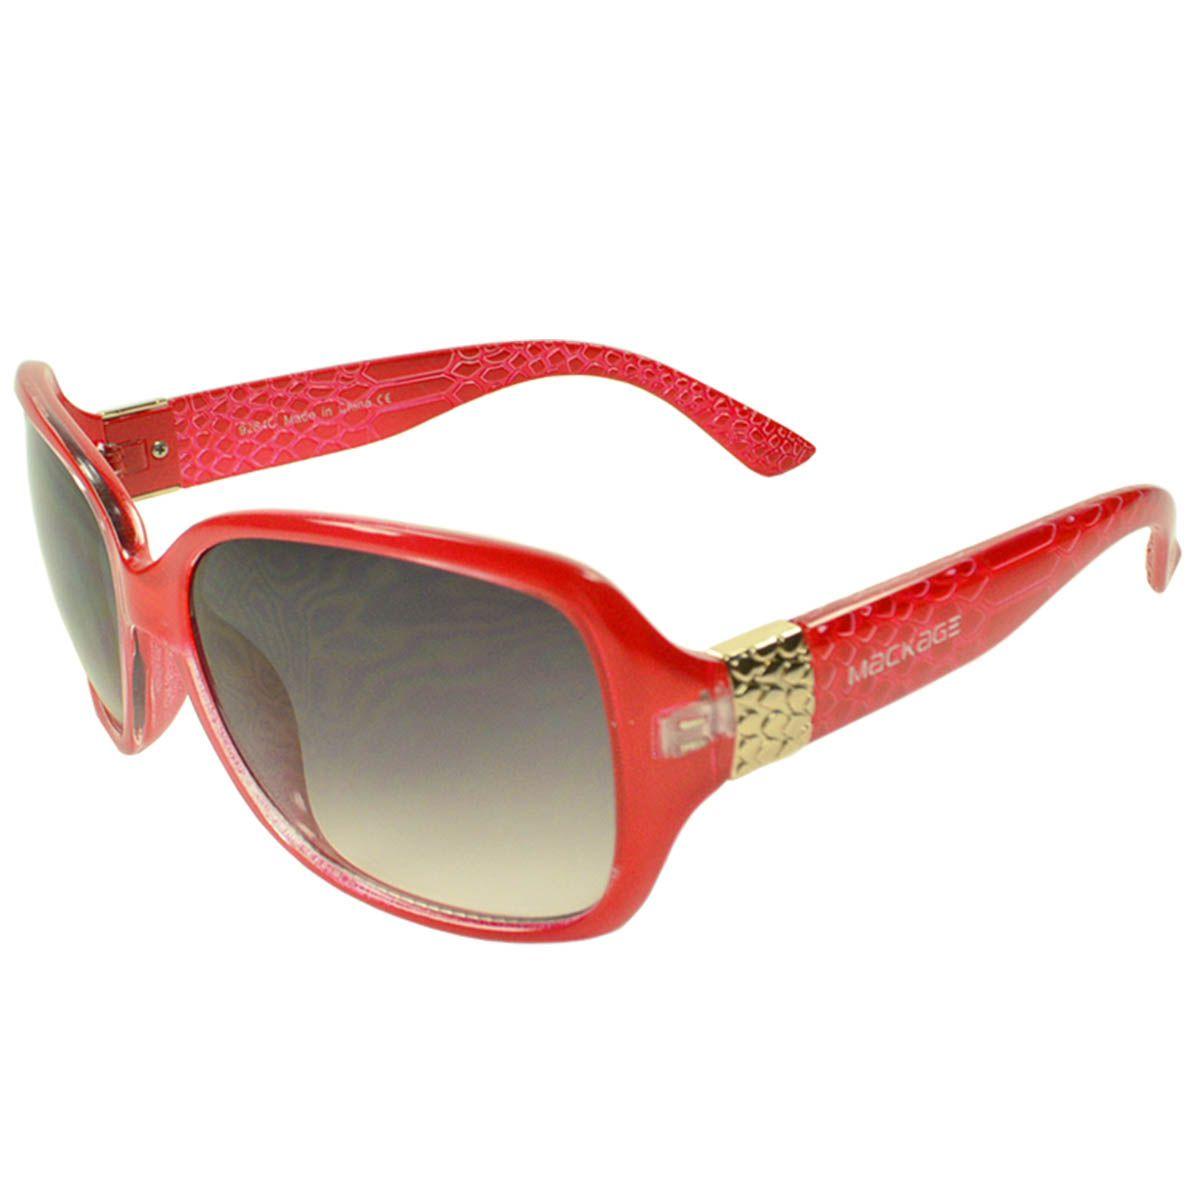 Óculos de Sol Feminino Mackage MK9284V Vermelho